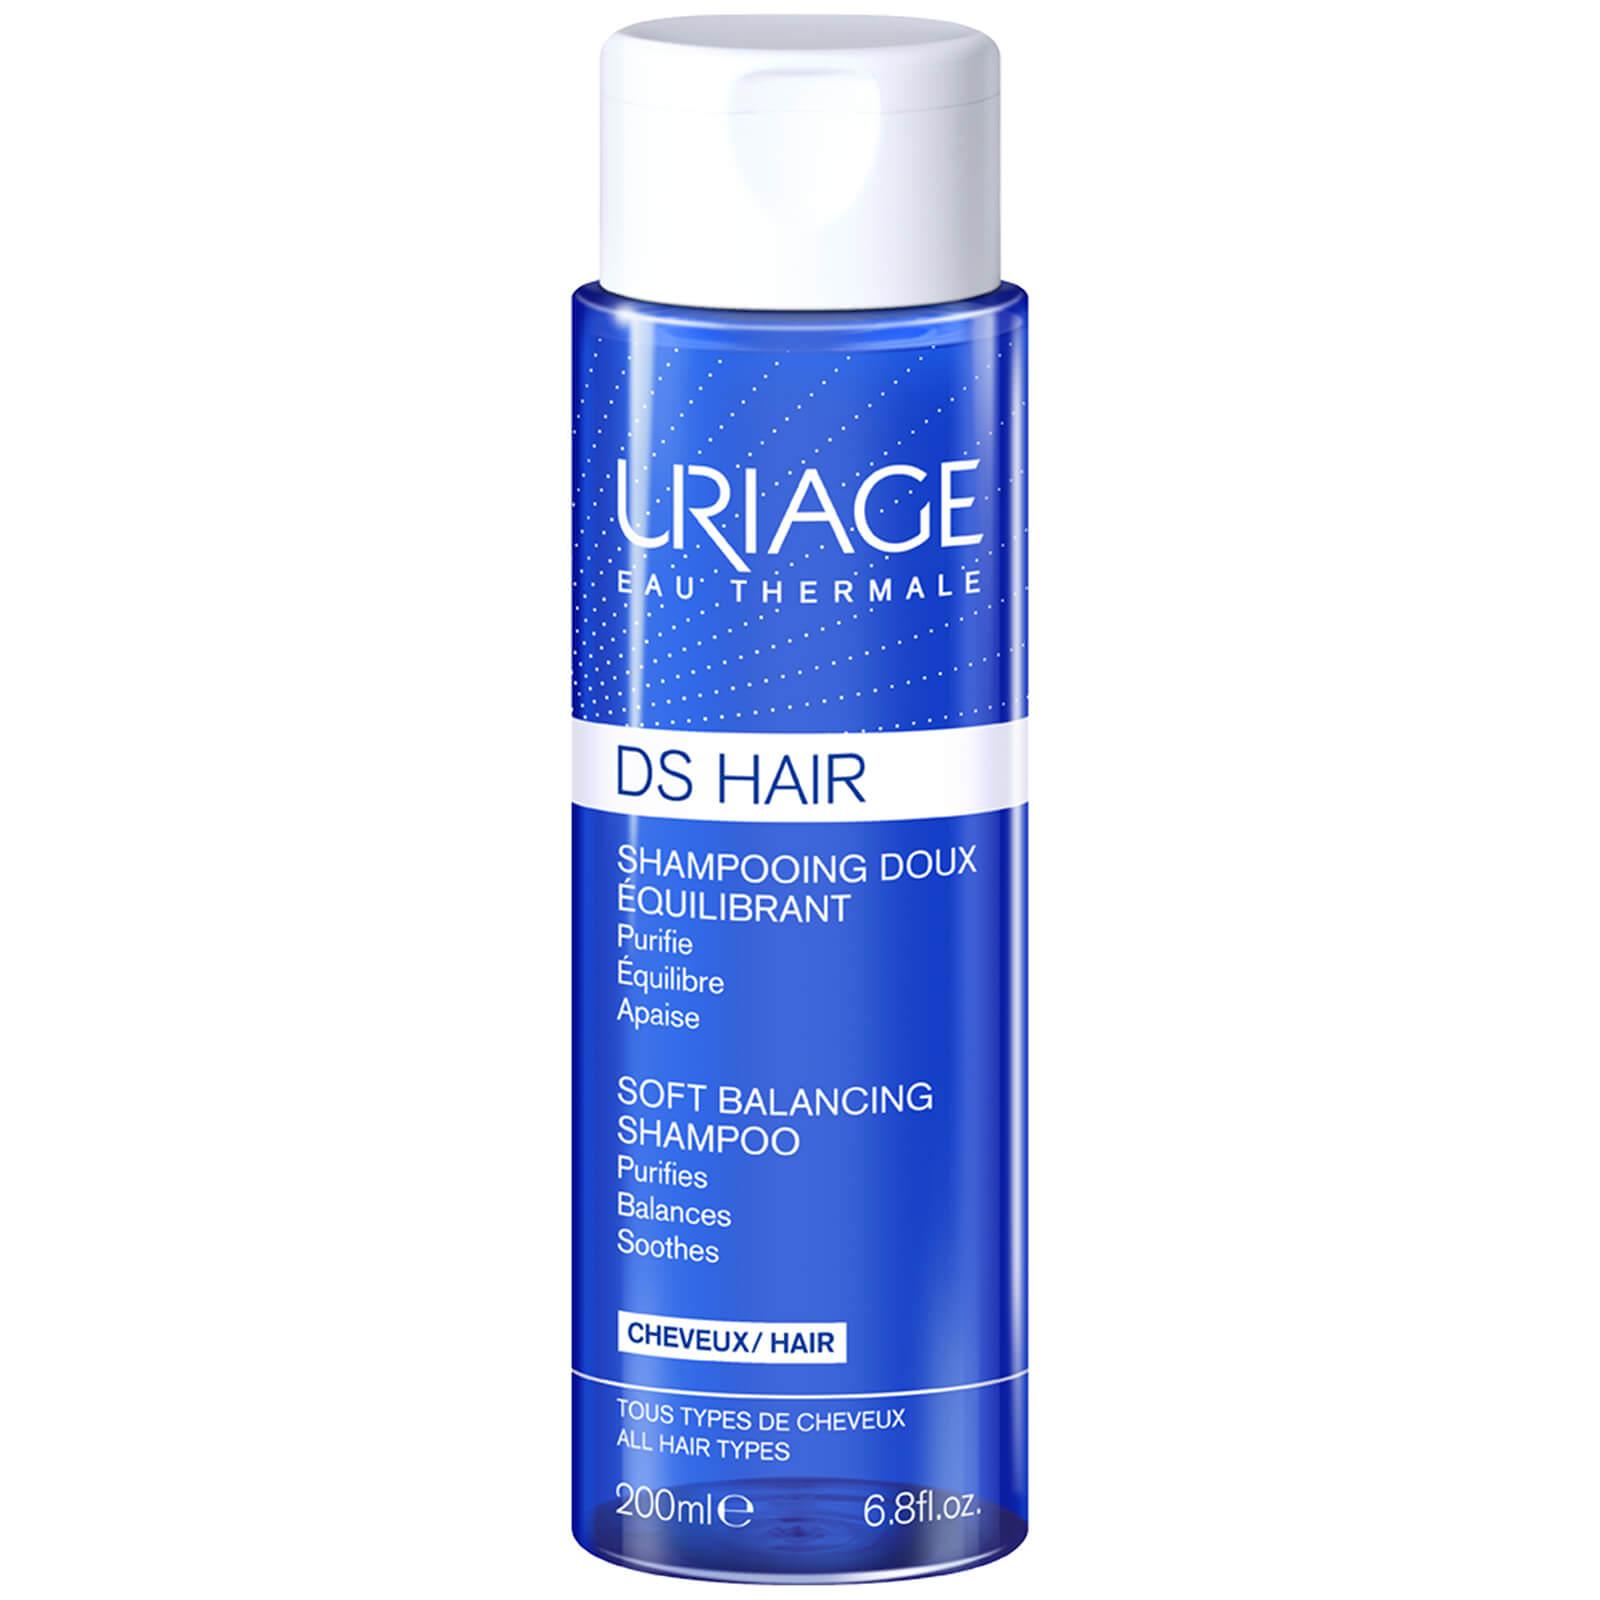 Uriage DS Hair Soft Balancing Shampoo 200ml